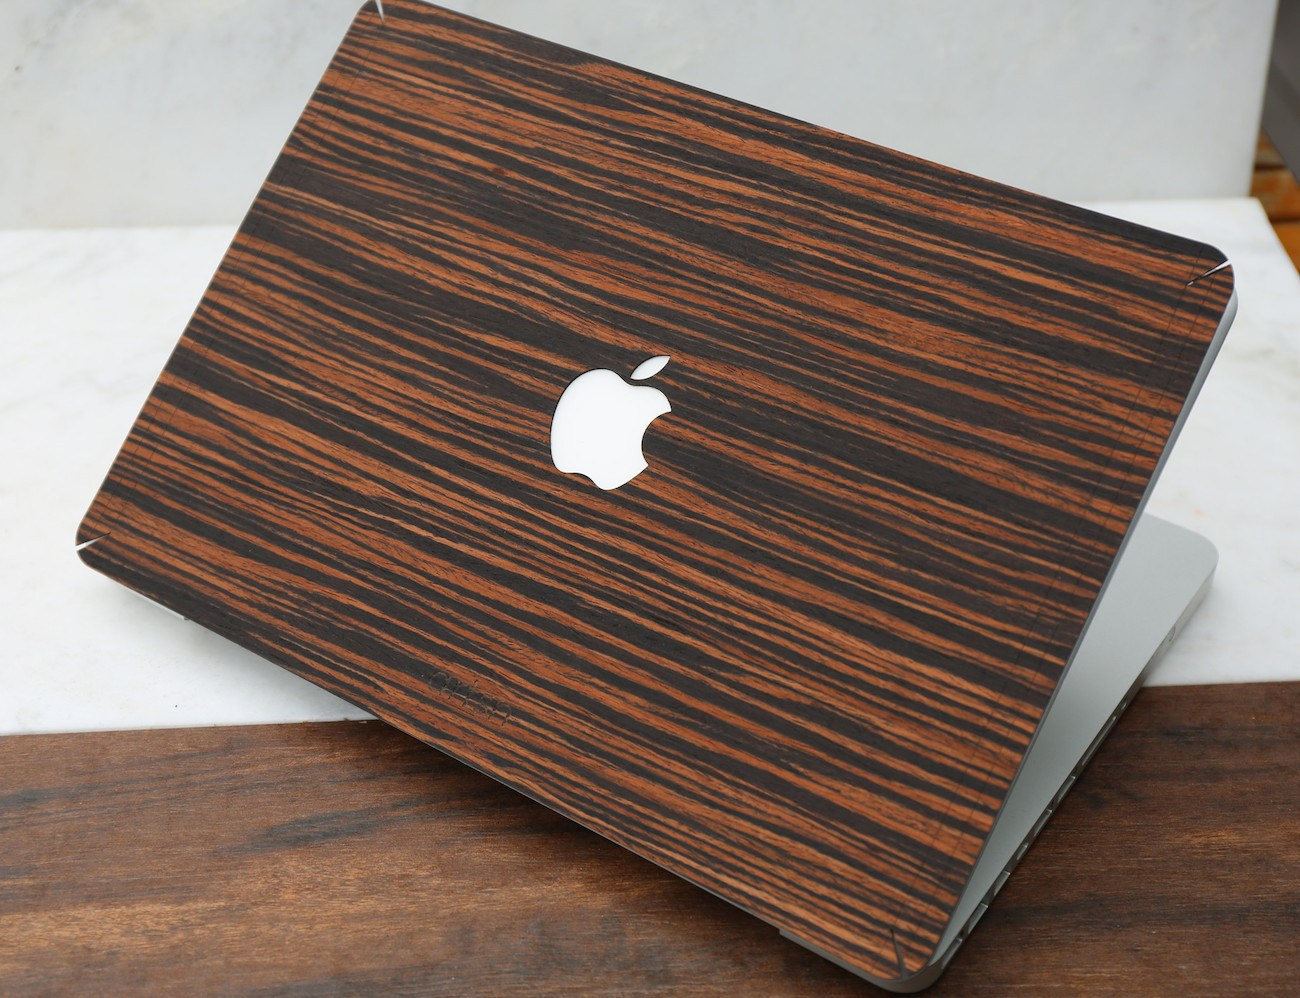 Wood+MacBook+Skin